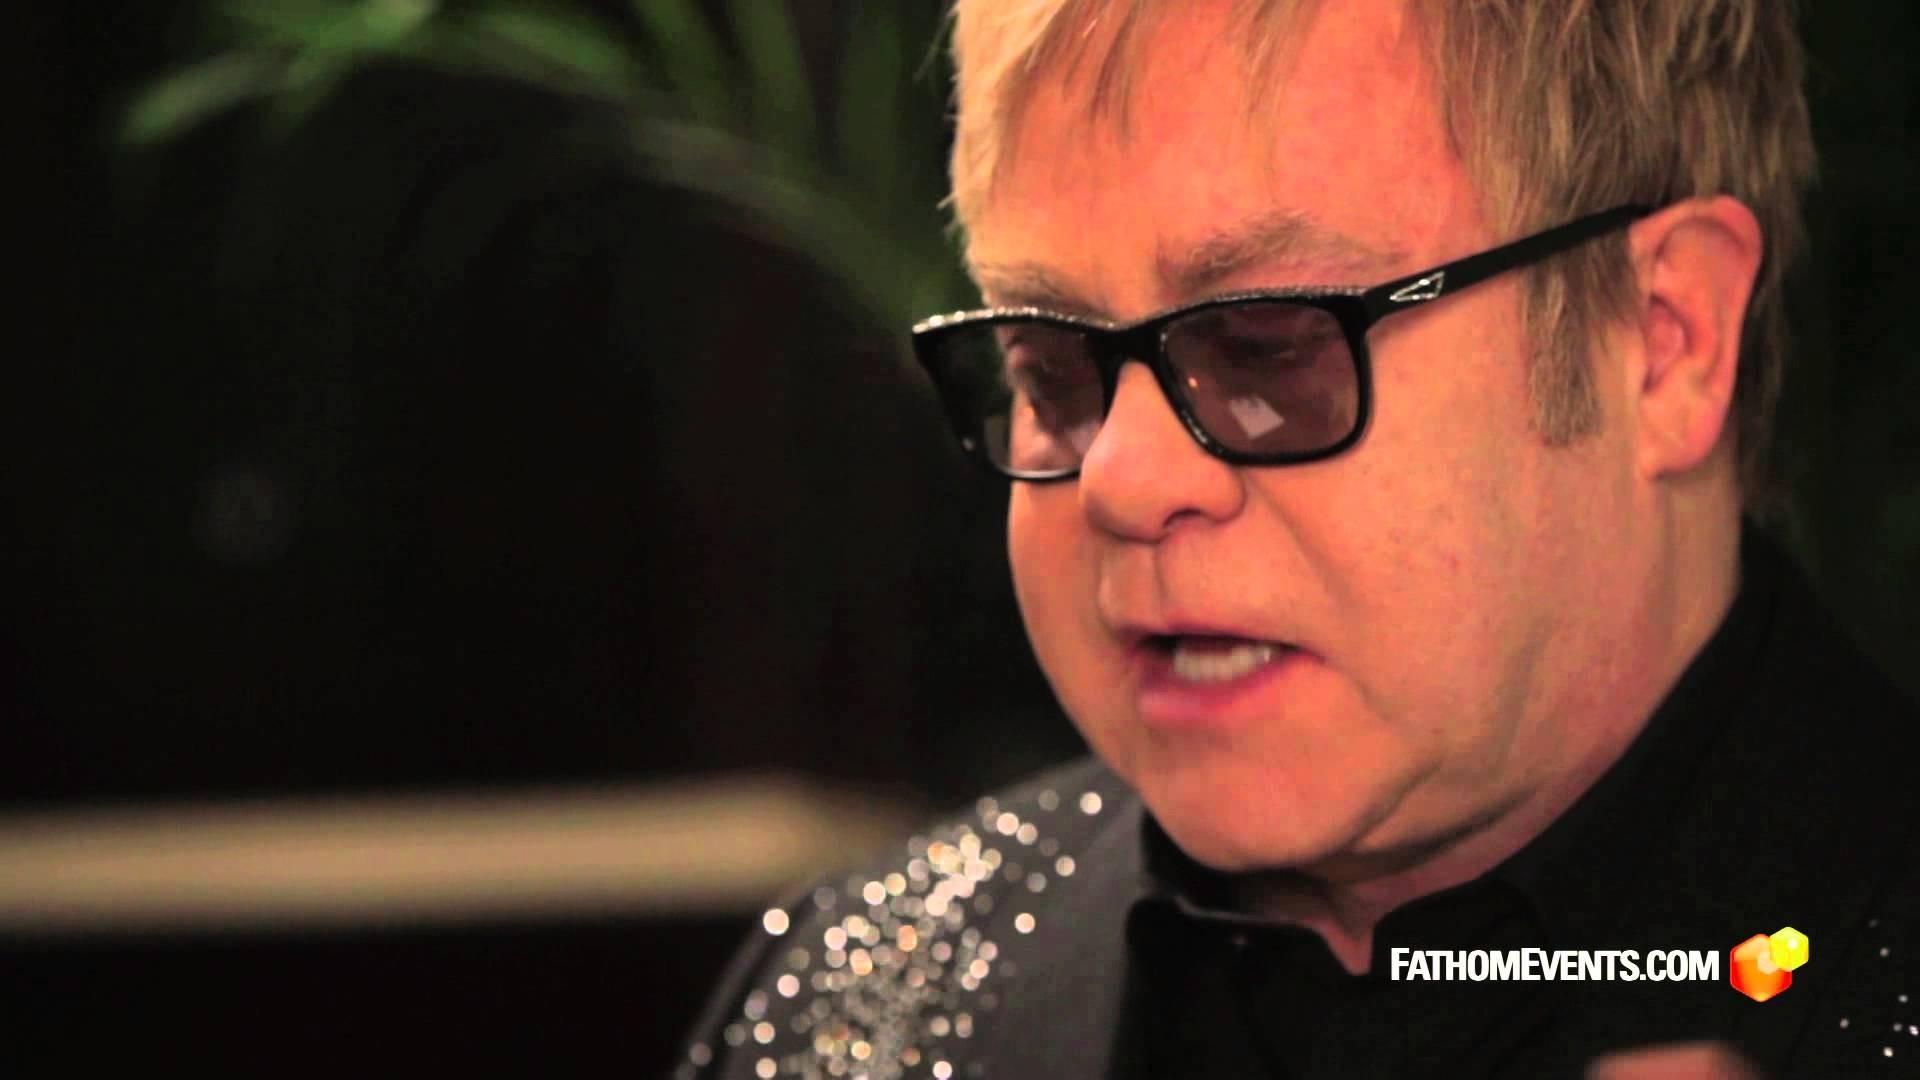 Fathom Events presents Elton John's glittering show 'The Million Dollar Piano'